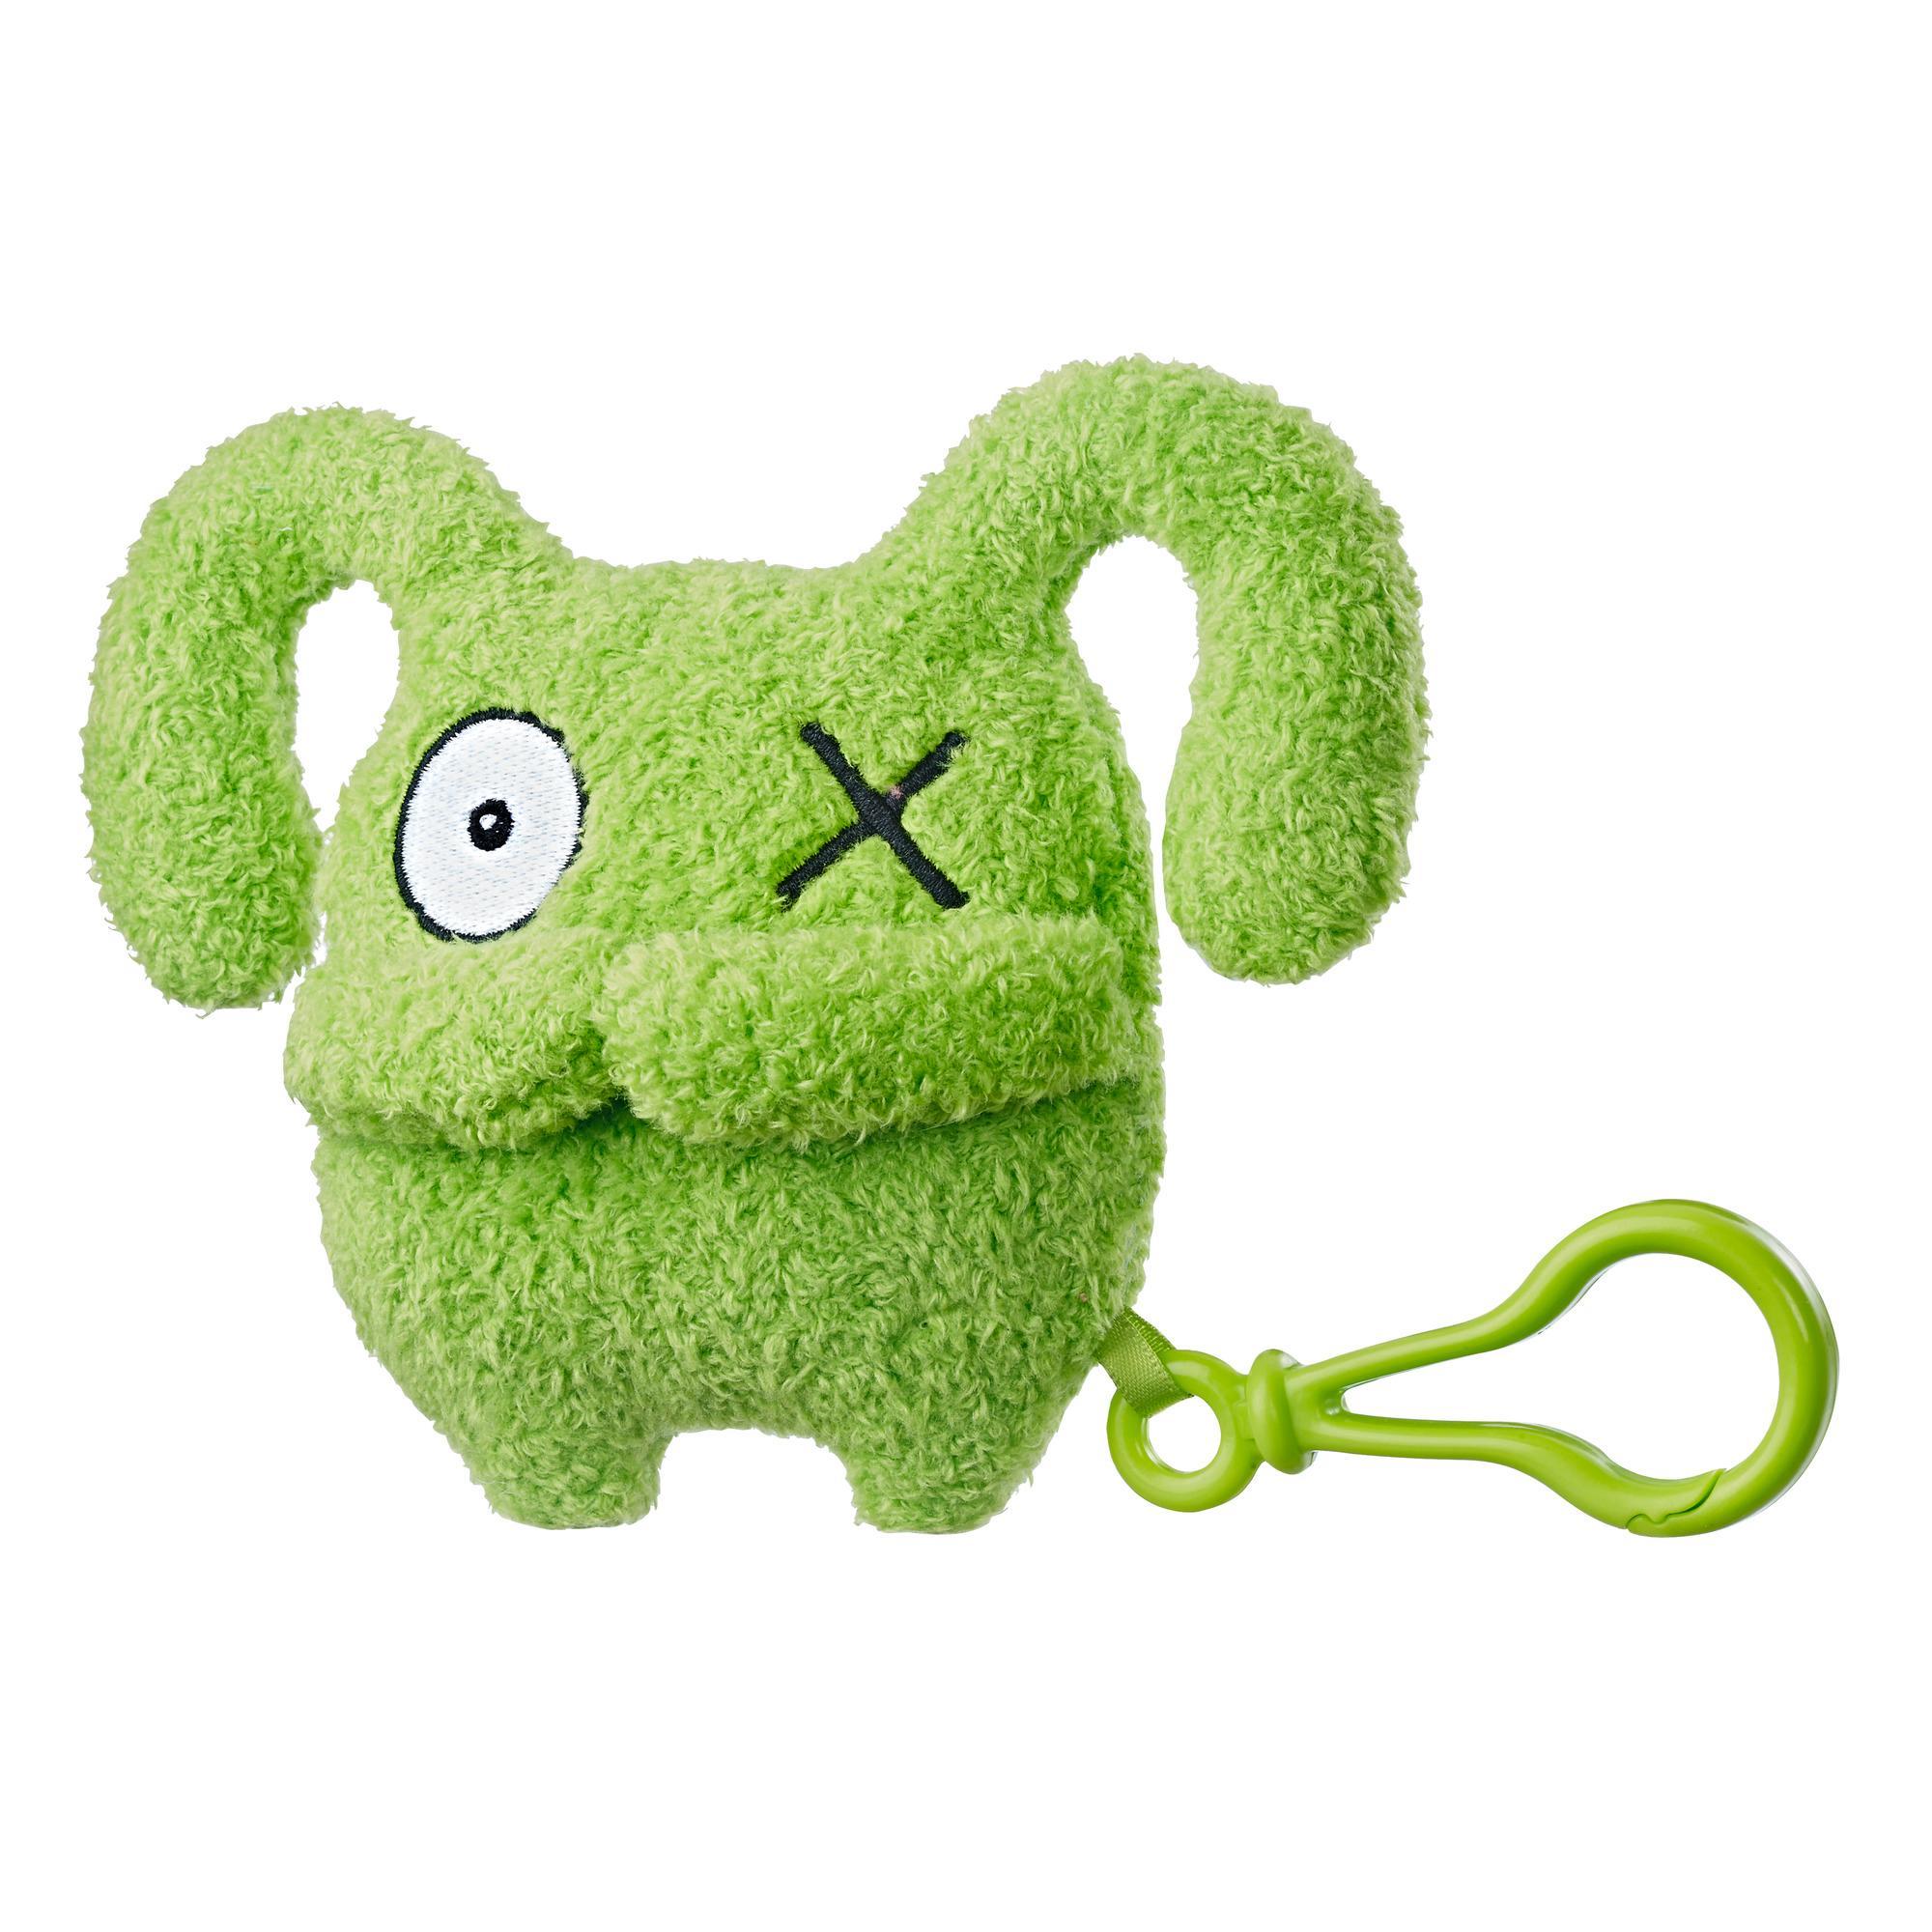 UglyDolls Ox Para Levar - Brinquedo de Pelúcia de 13 cm